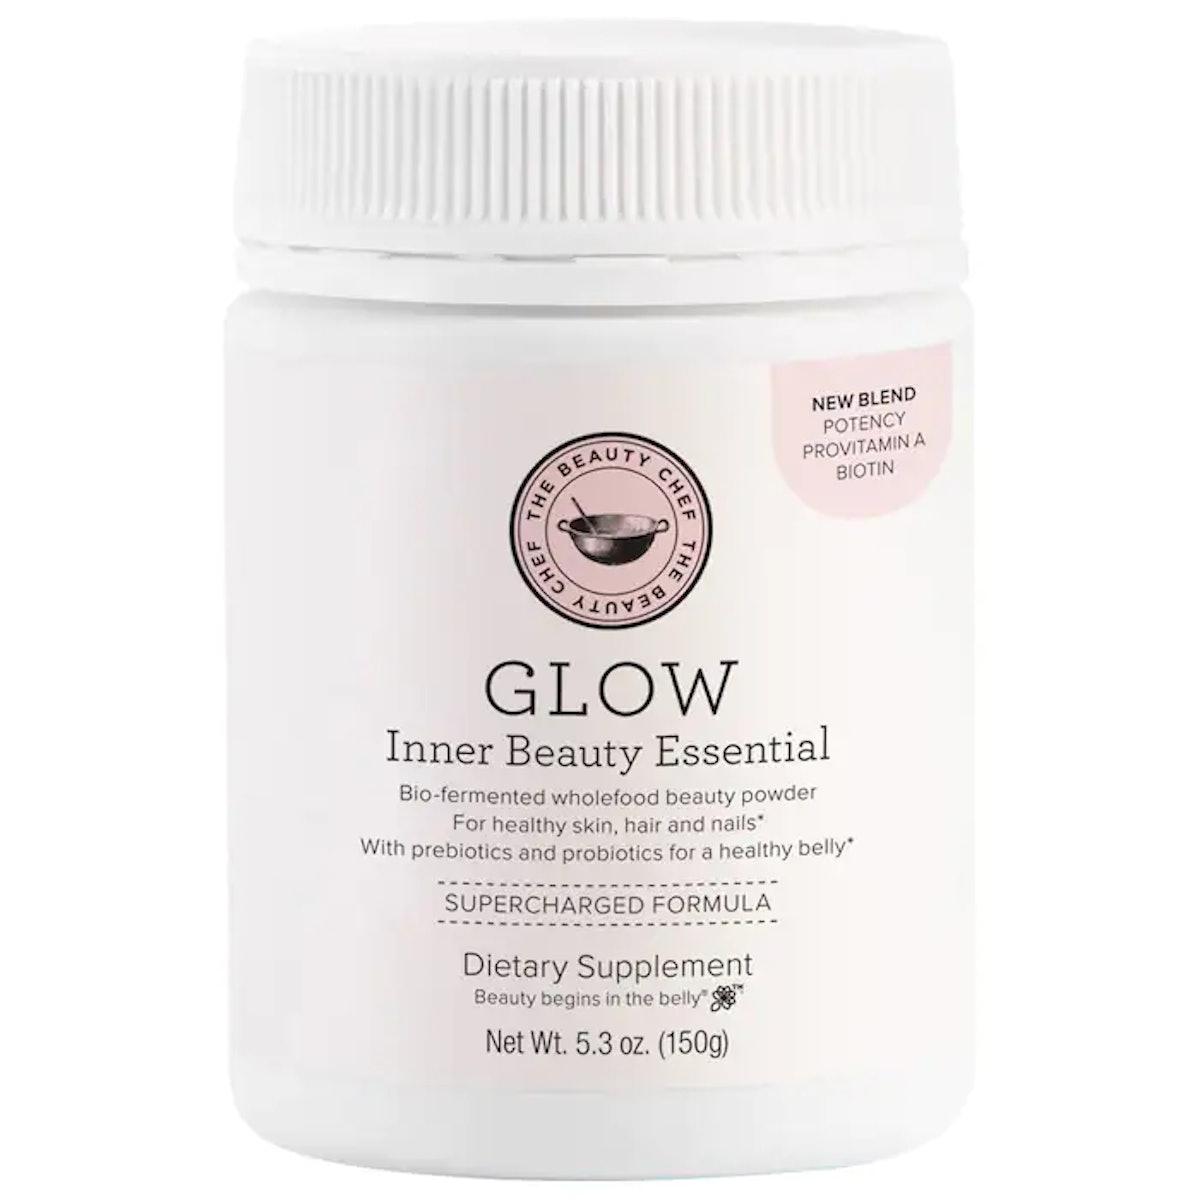 GLOW Inner Beauty Essential